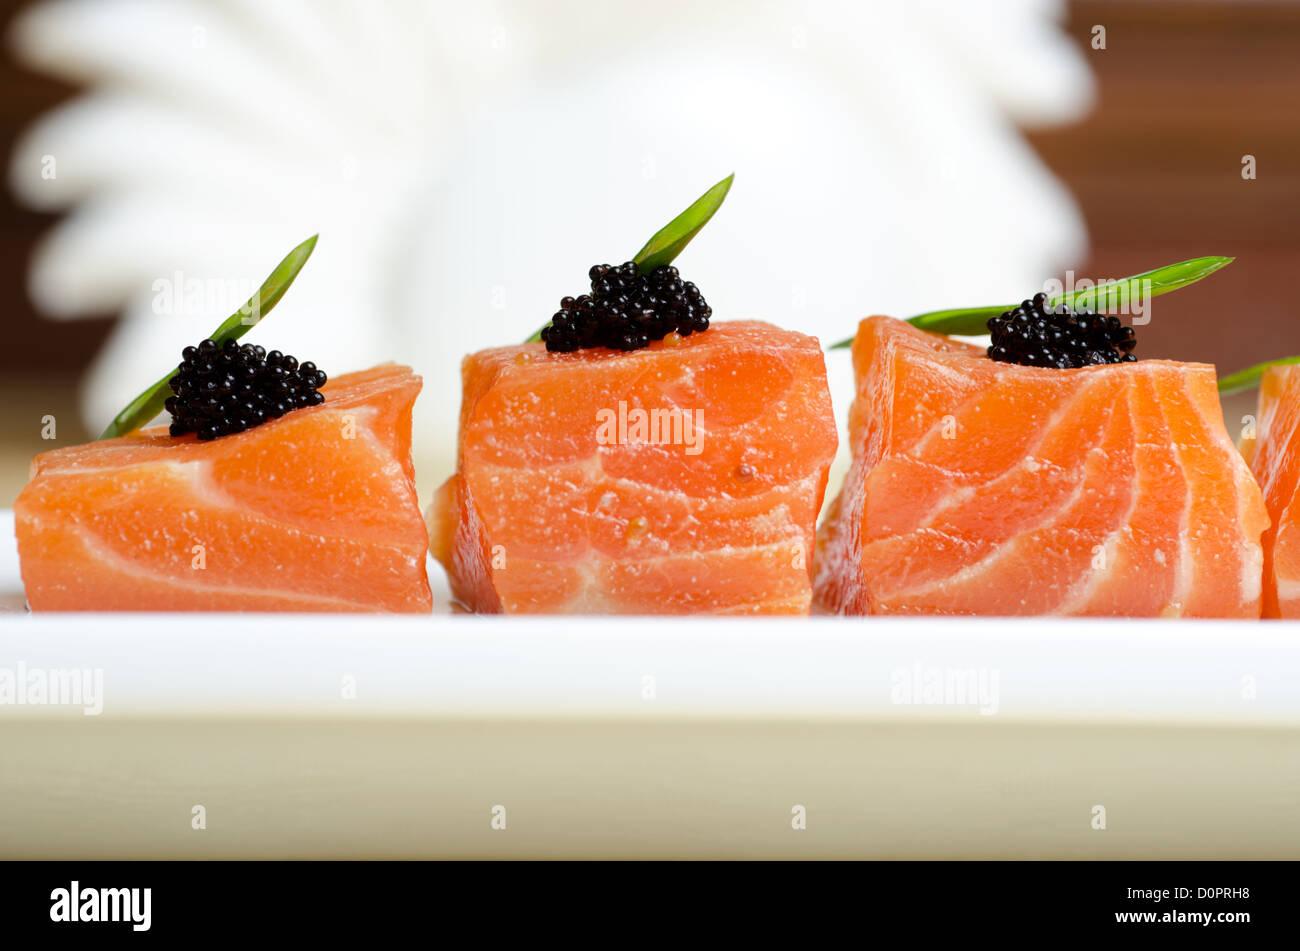 Salmon Slices - Stock Image